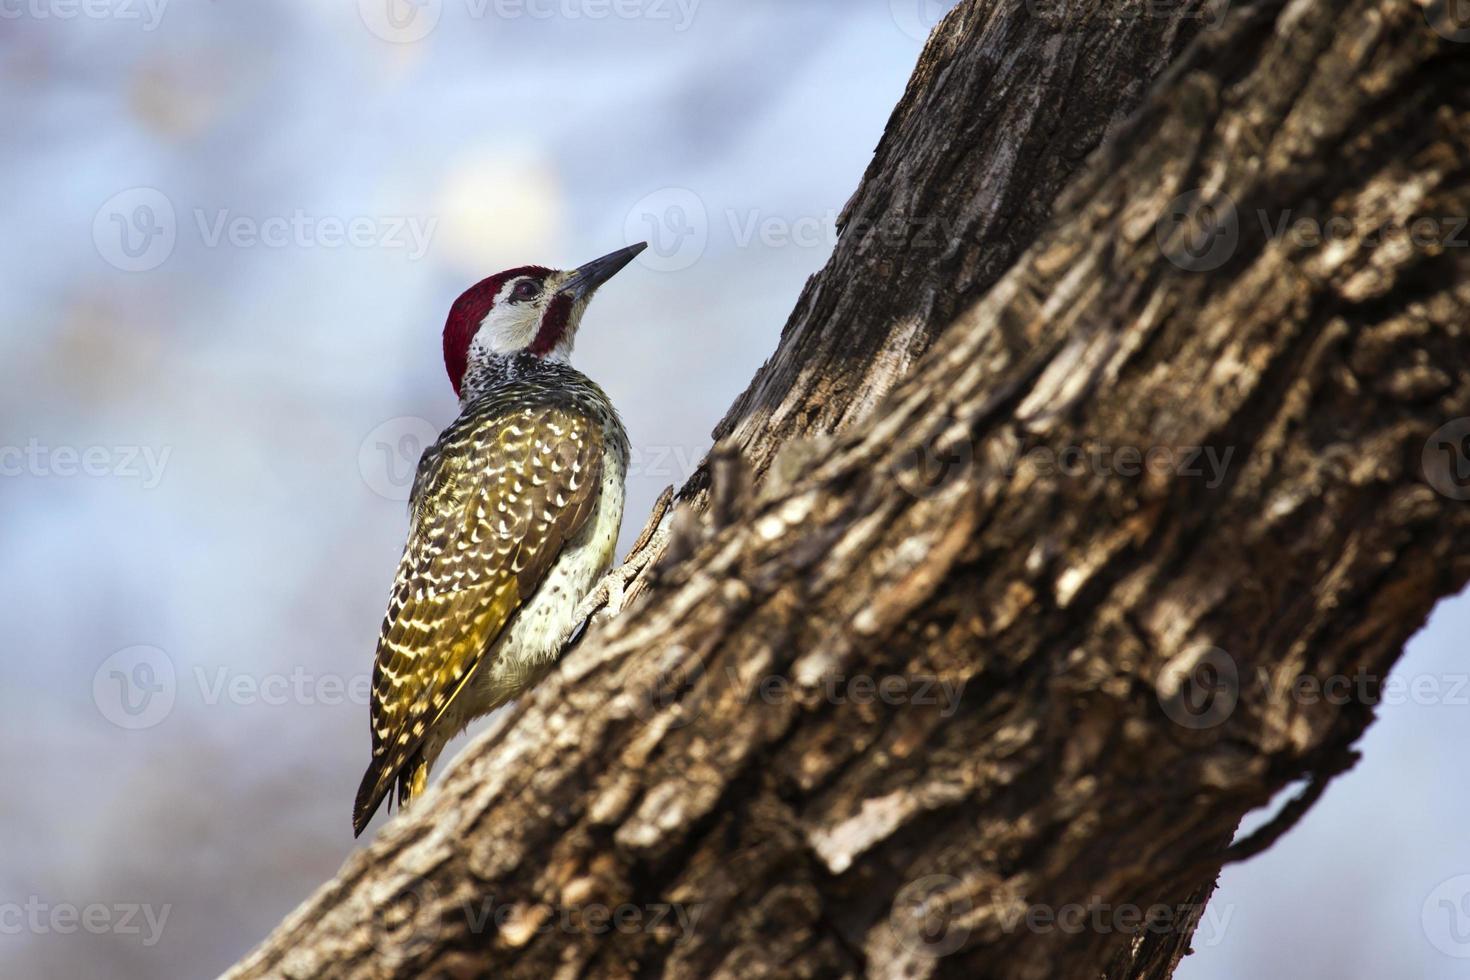 bennetts hackspett i Kruger nationalpark foto